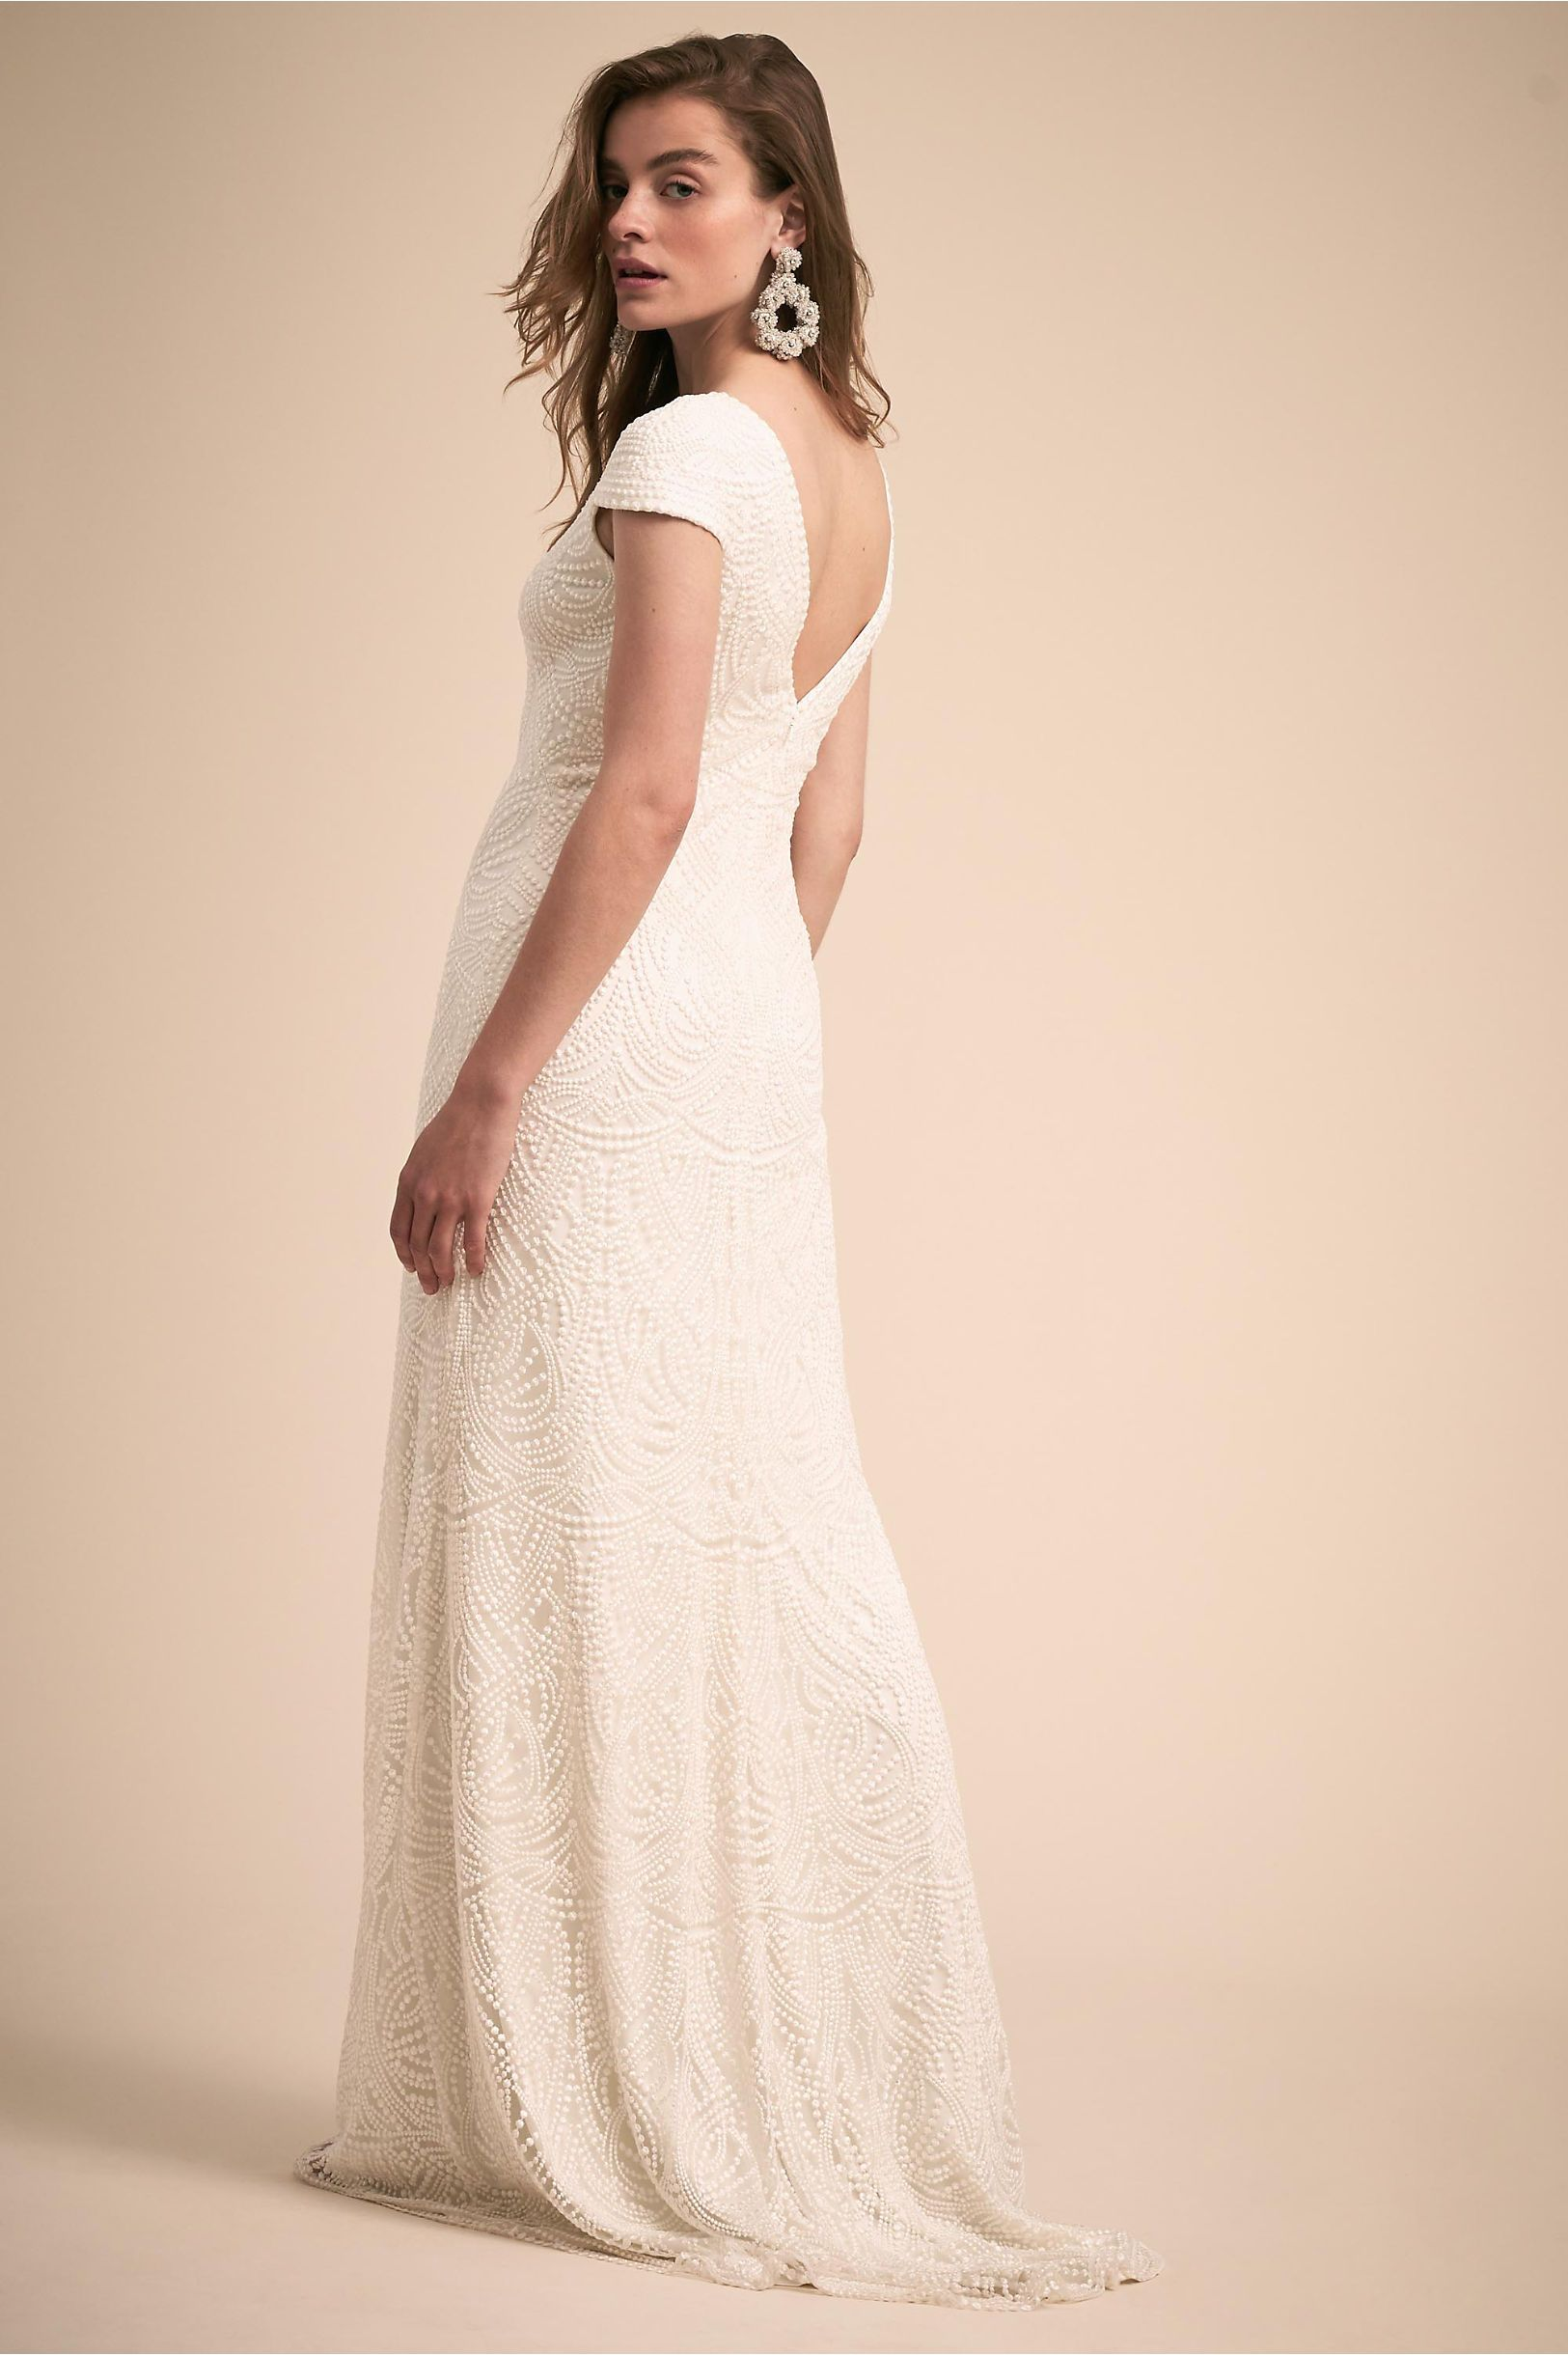 Leeds Gown | Wedding dress cap sleeves